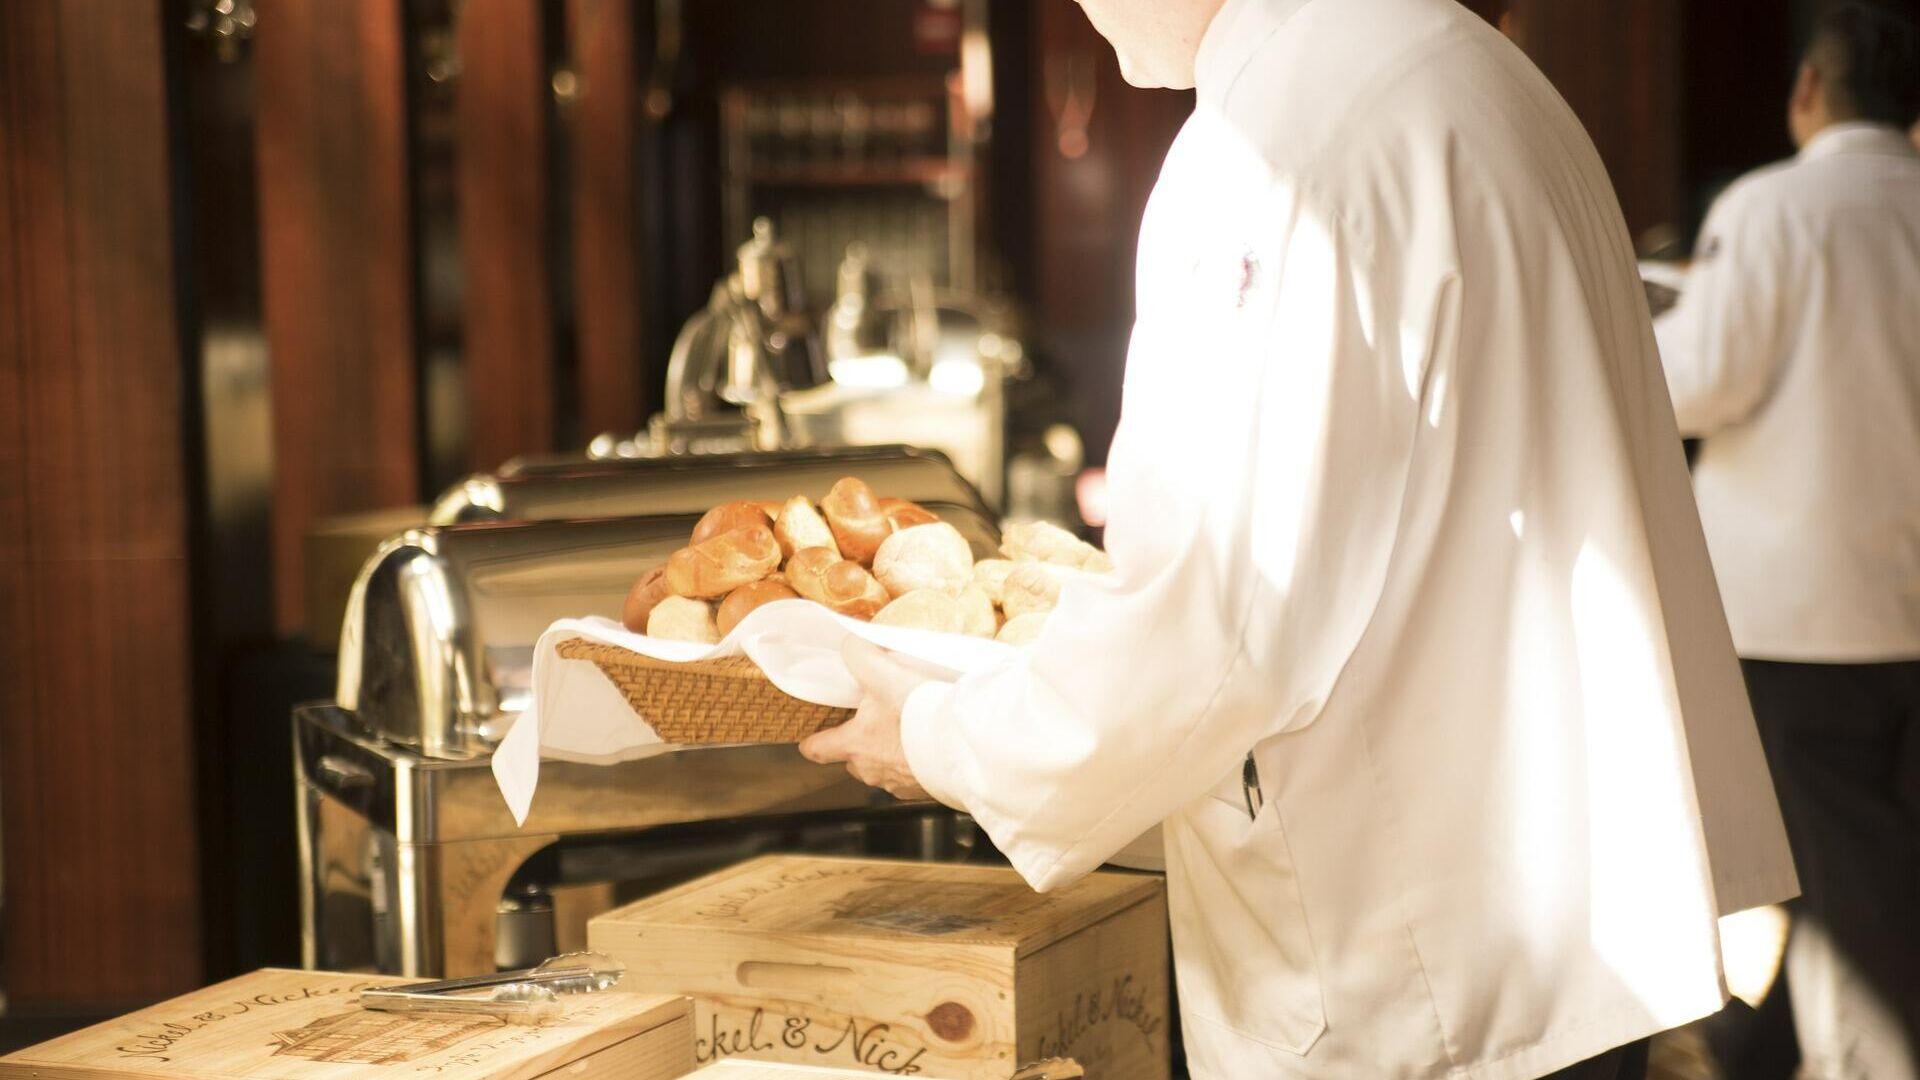 Un mozo, camarero, de restaurante. Imagen referencial - Sputnik Mundo, 1920, 04.05.2021